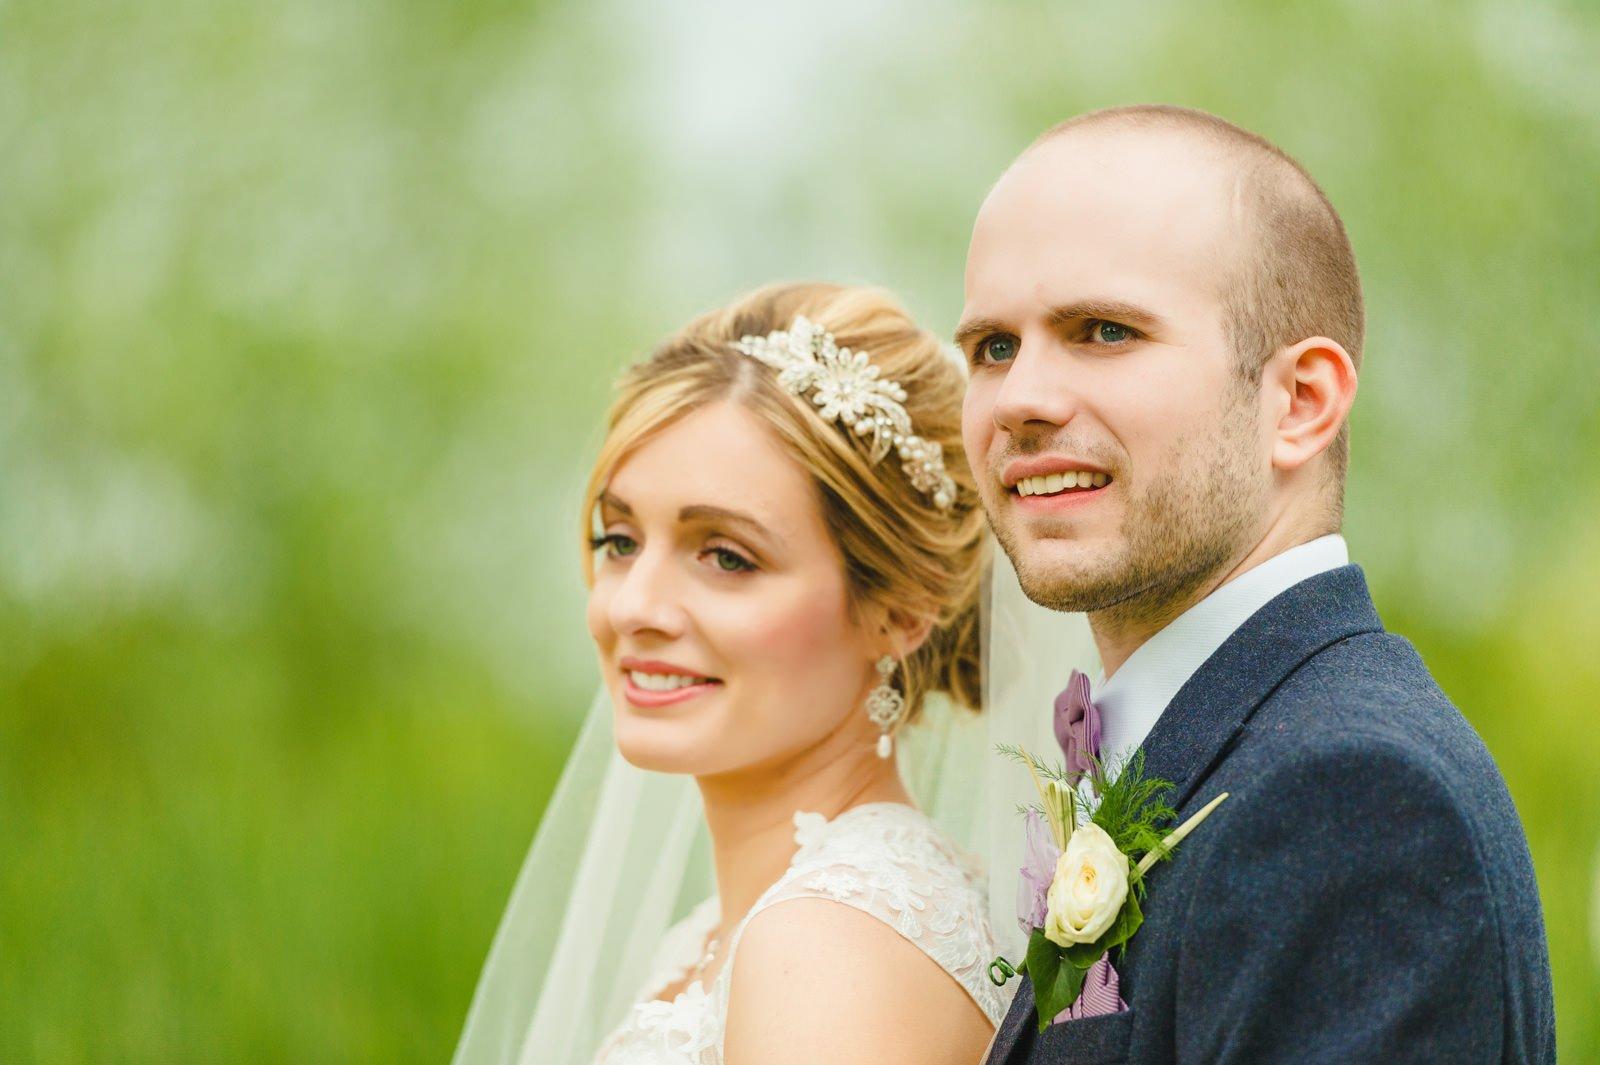 Millers Of Netley wedding, Dorrington, Shrewsbury | Emma + Ben 66